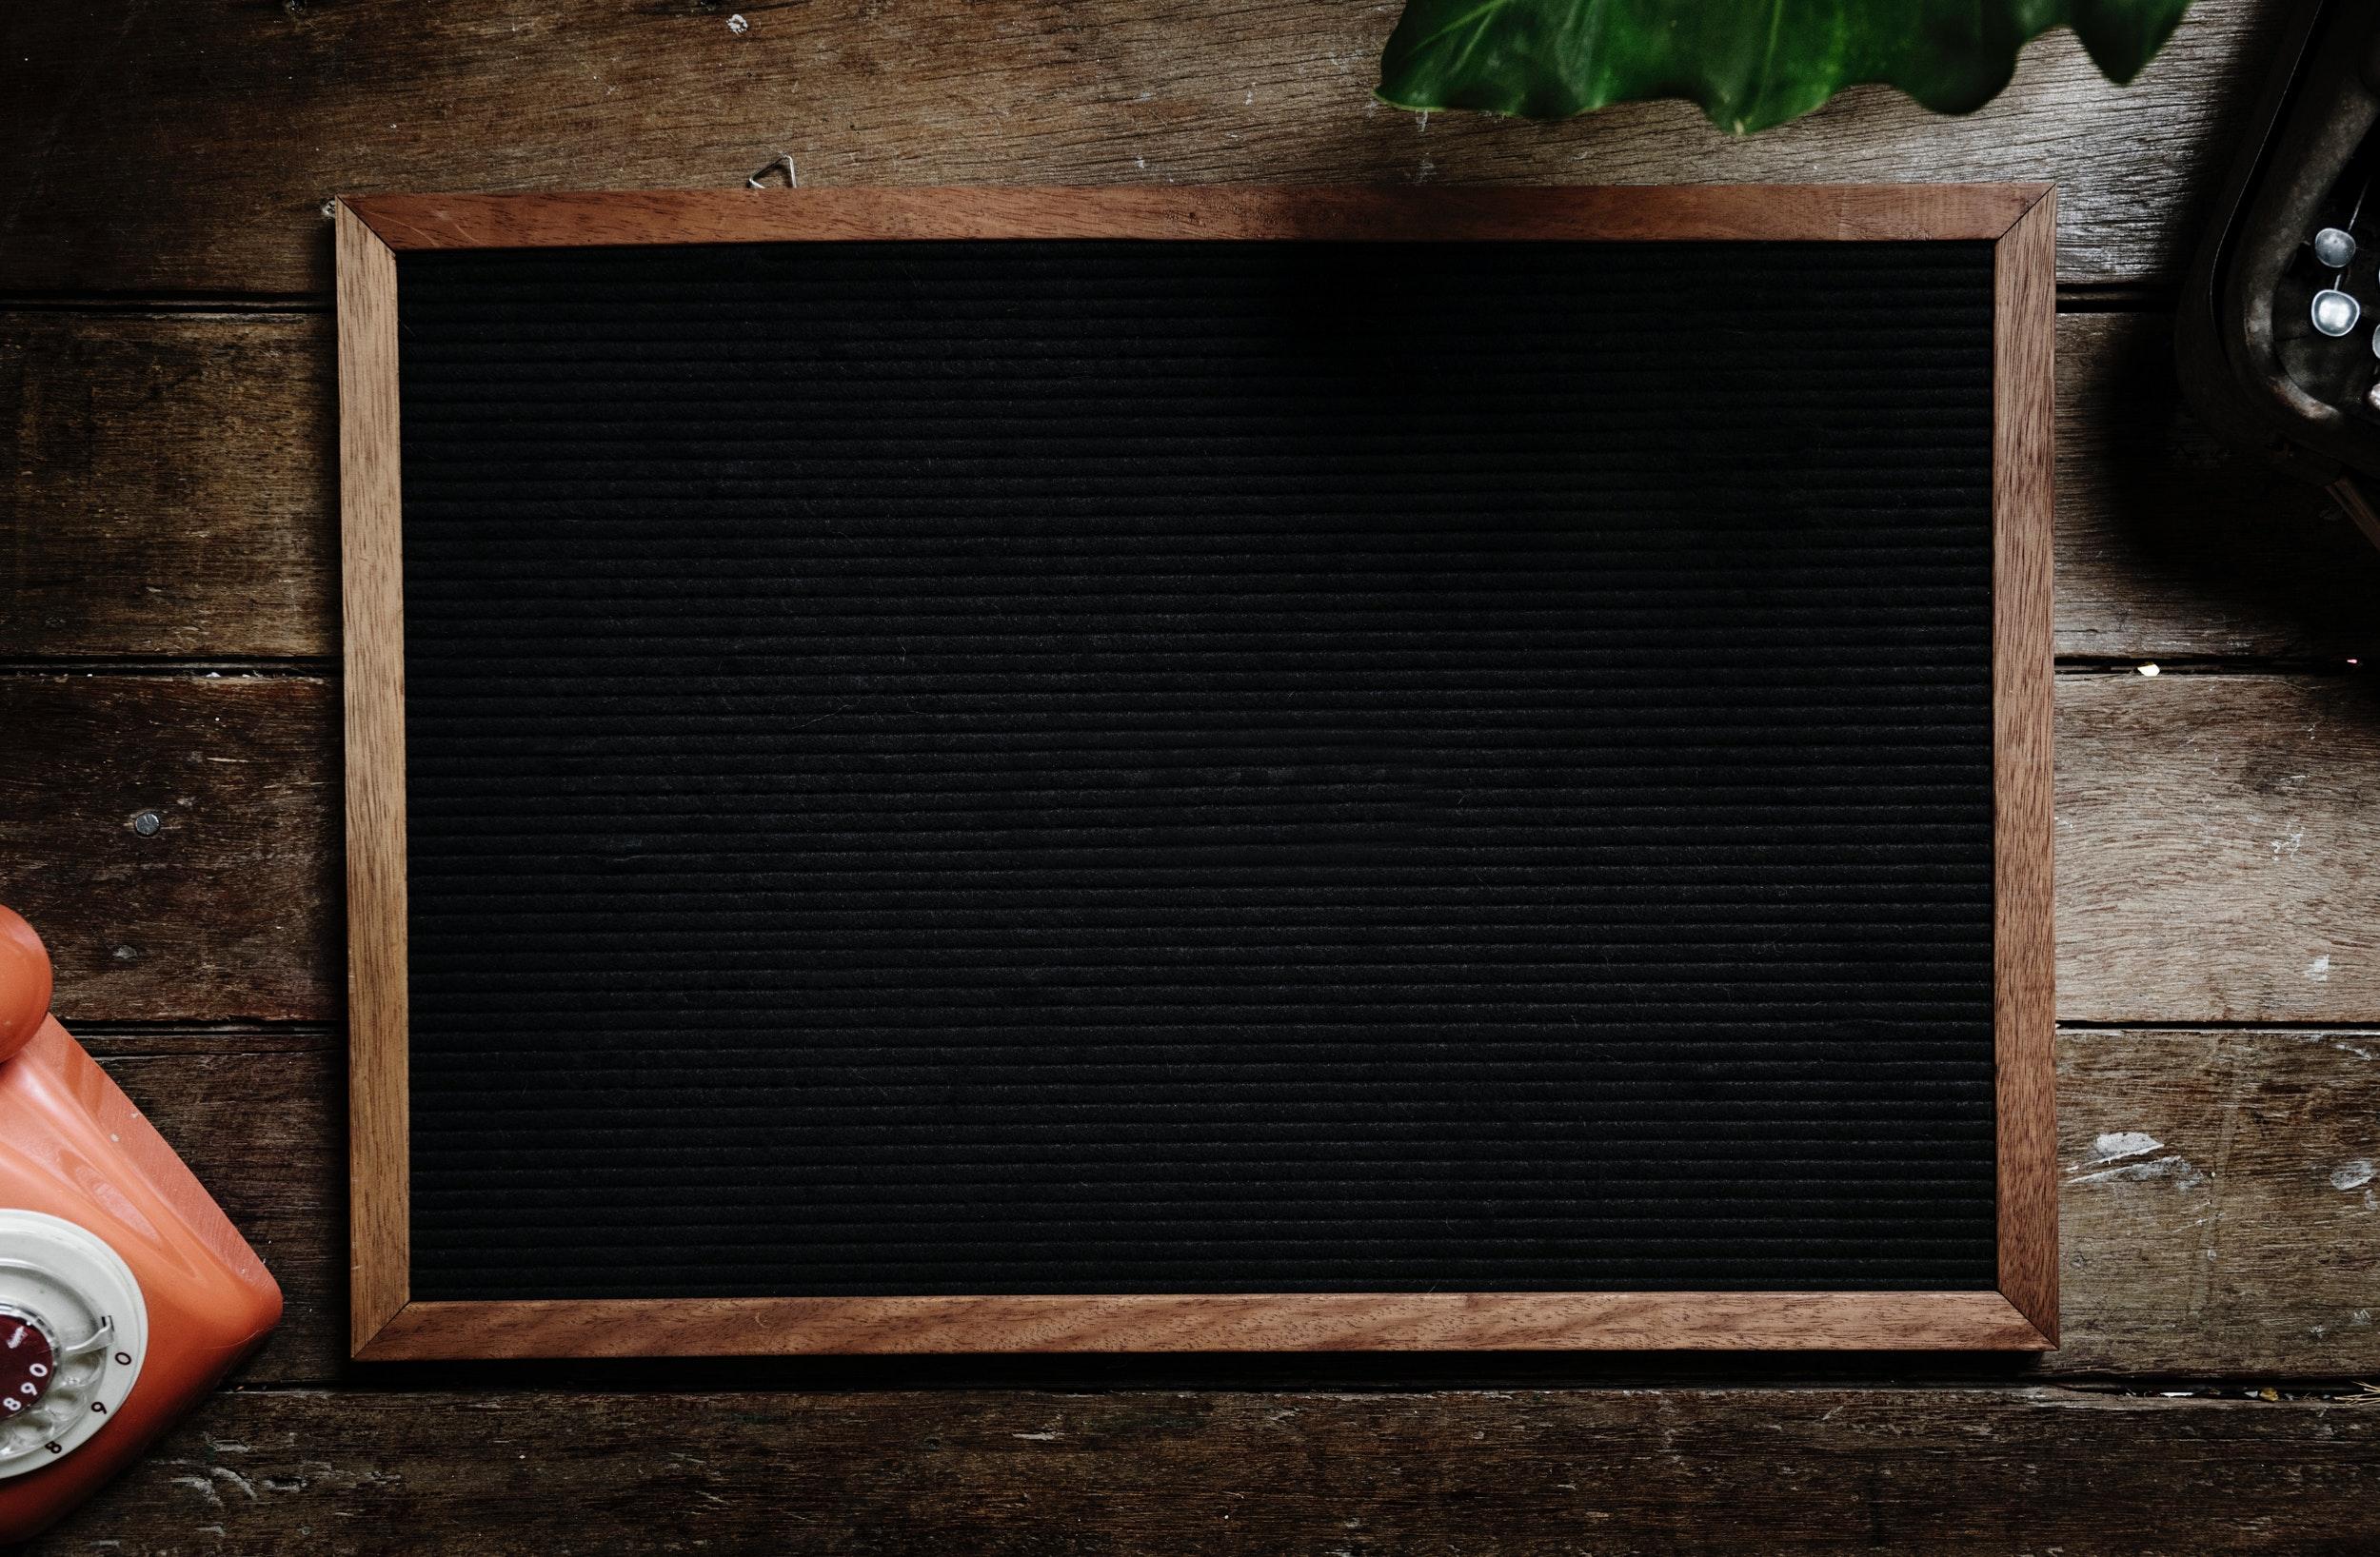 A blank black chalkboard on a wooden table.